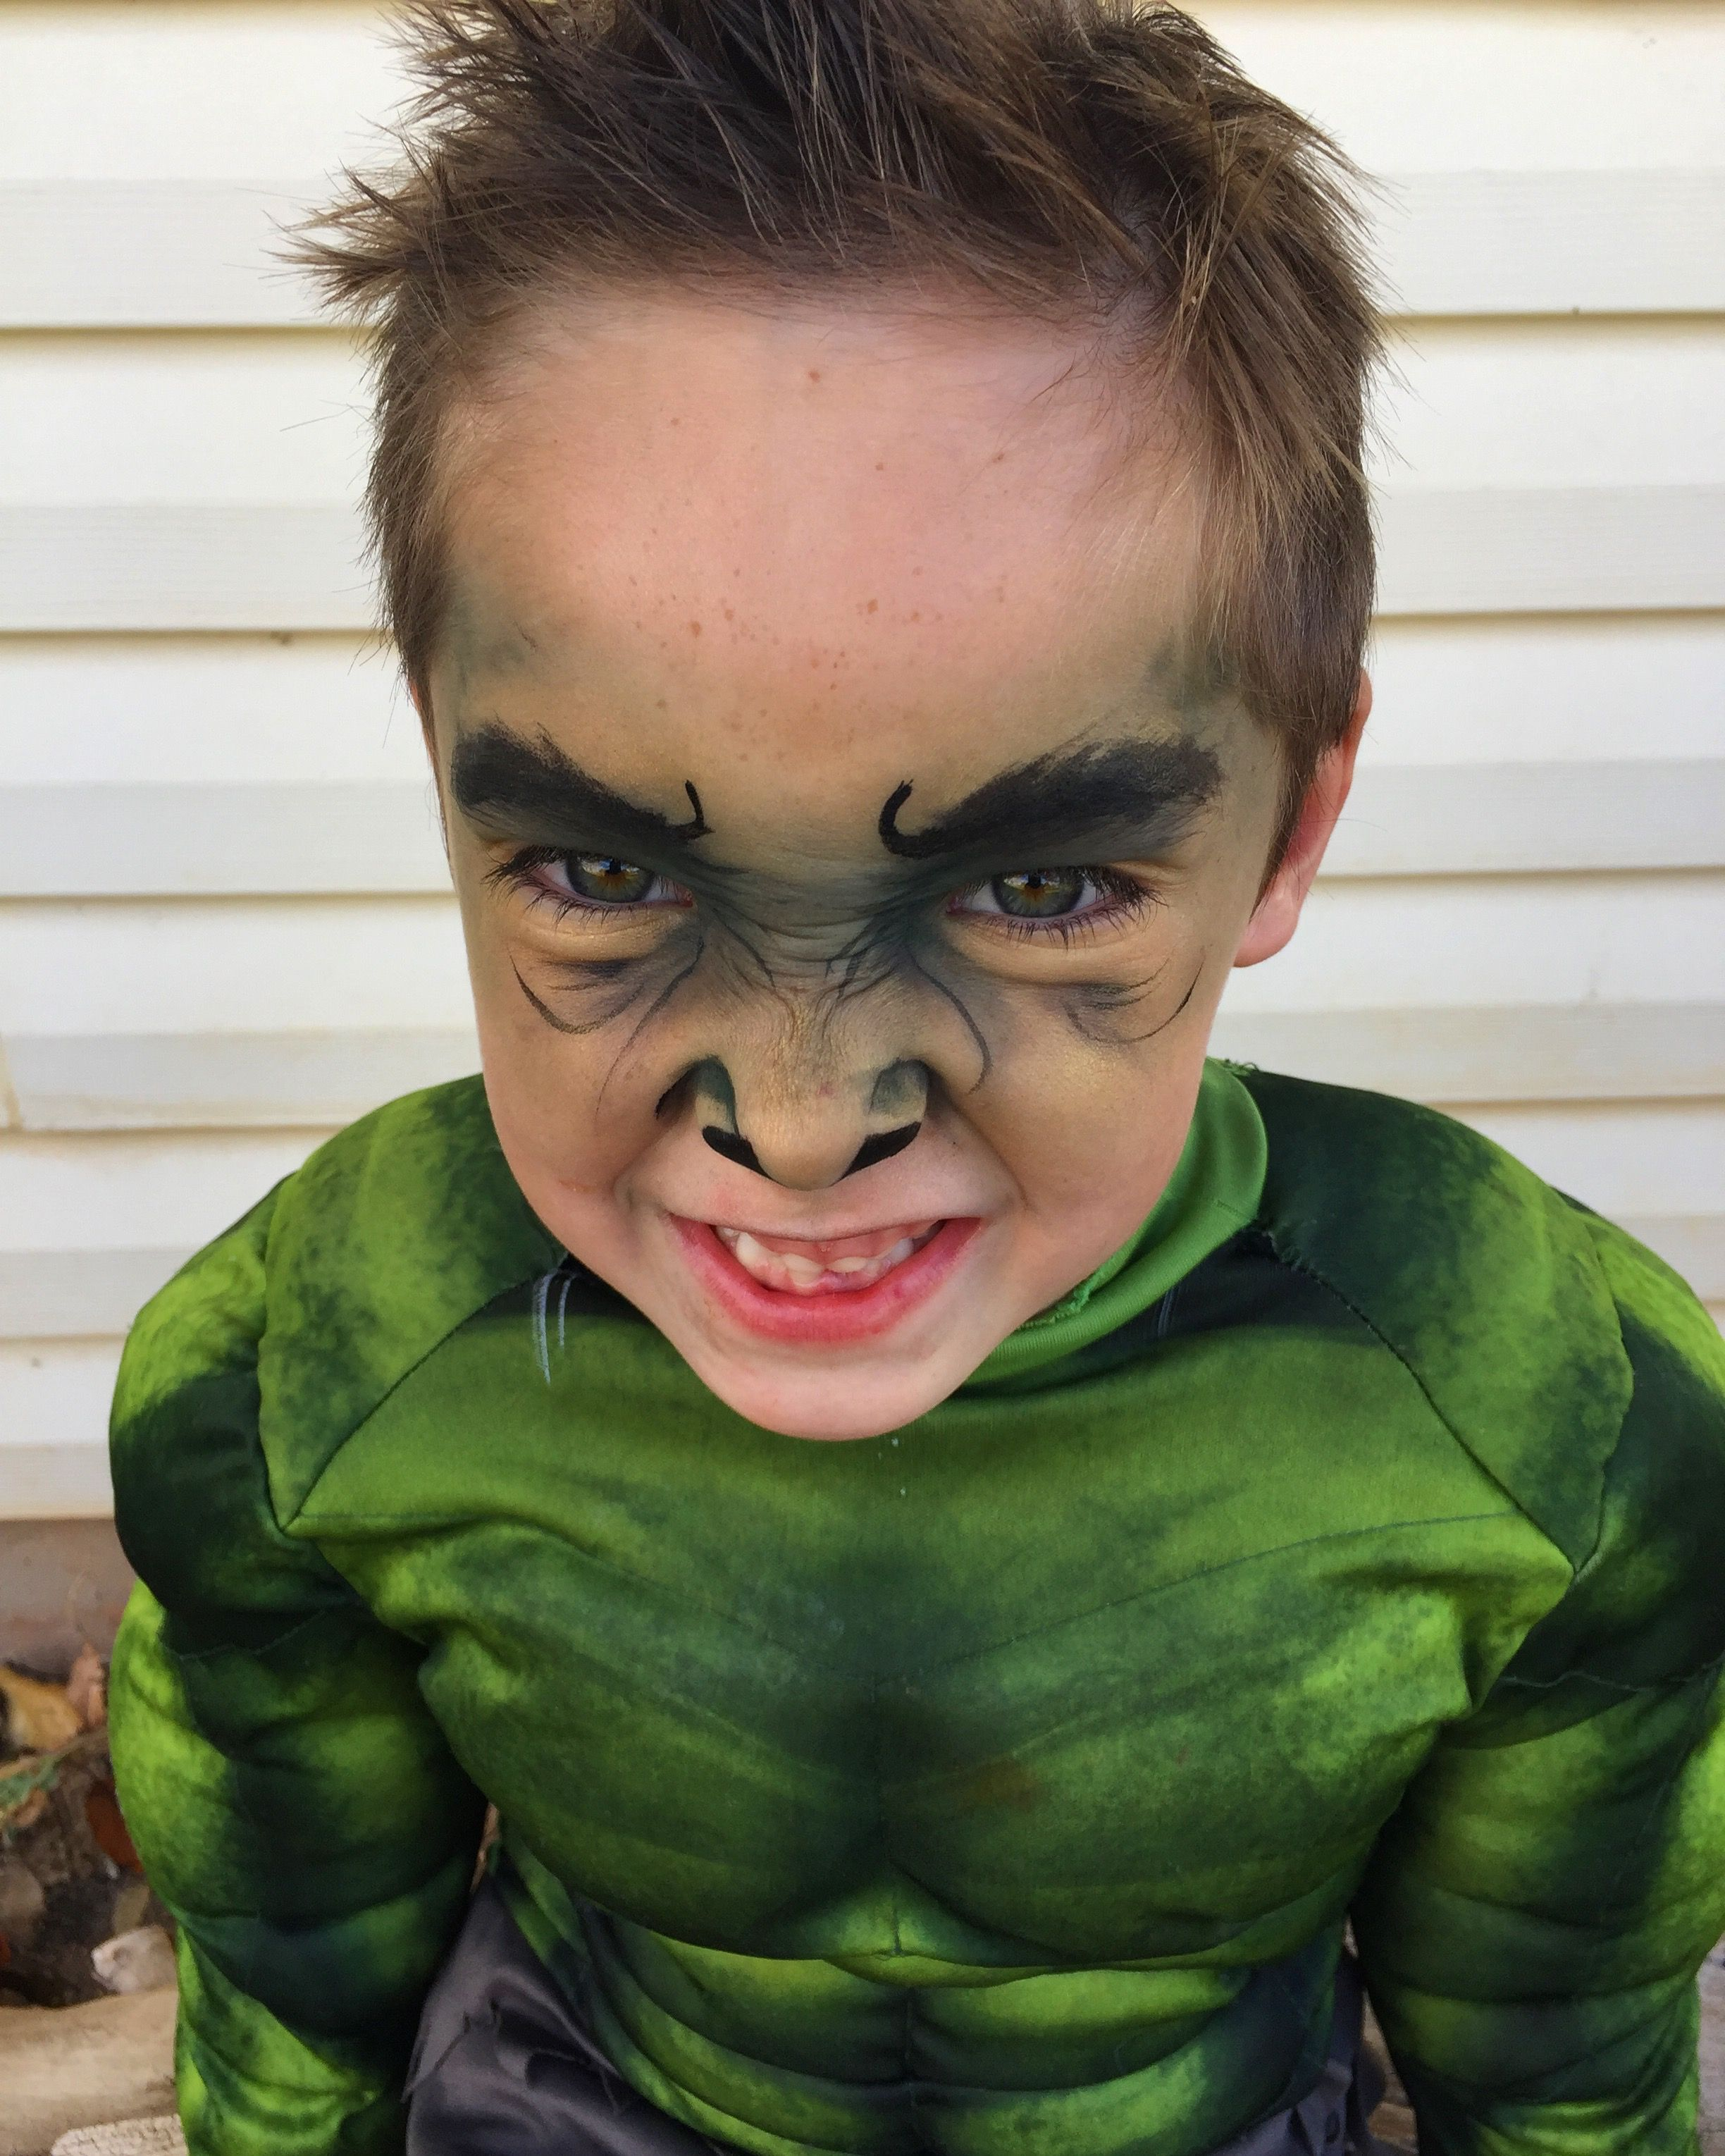 Incredible Hulk Makeup Little Boys Hulk Makeup For Halloween Hulk Kids Halloween Makeup Kids Face Paint